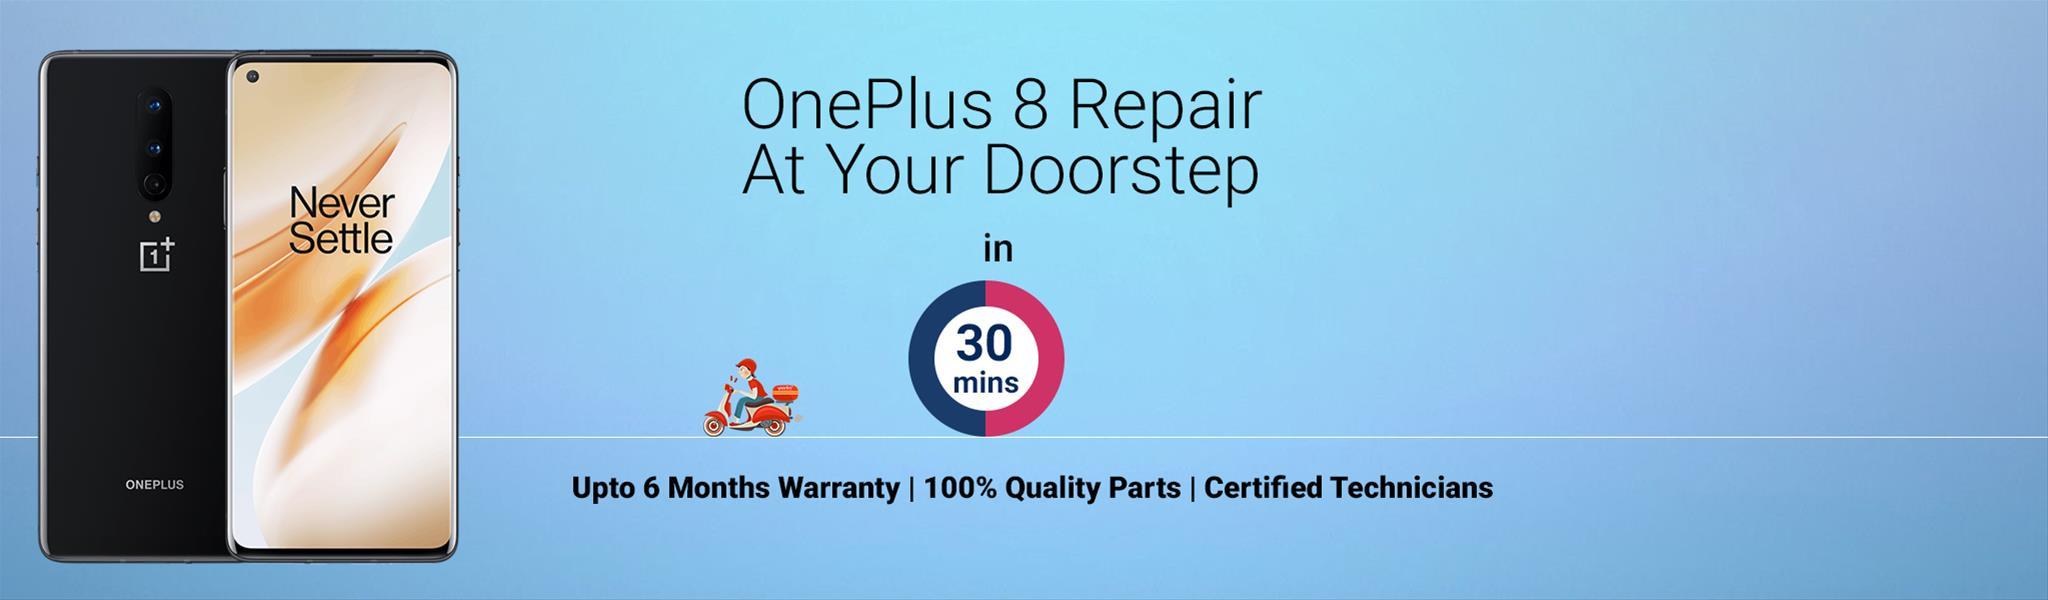 oneplus-8-repair.jpg